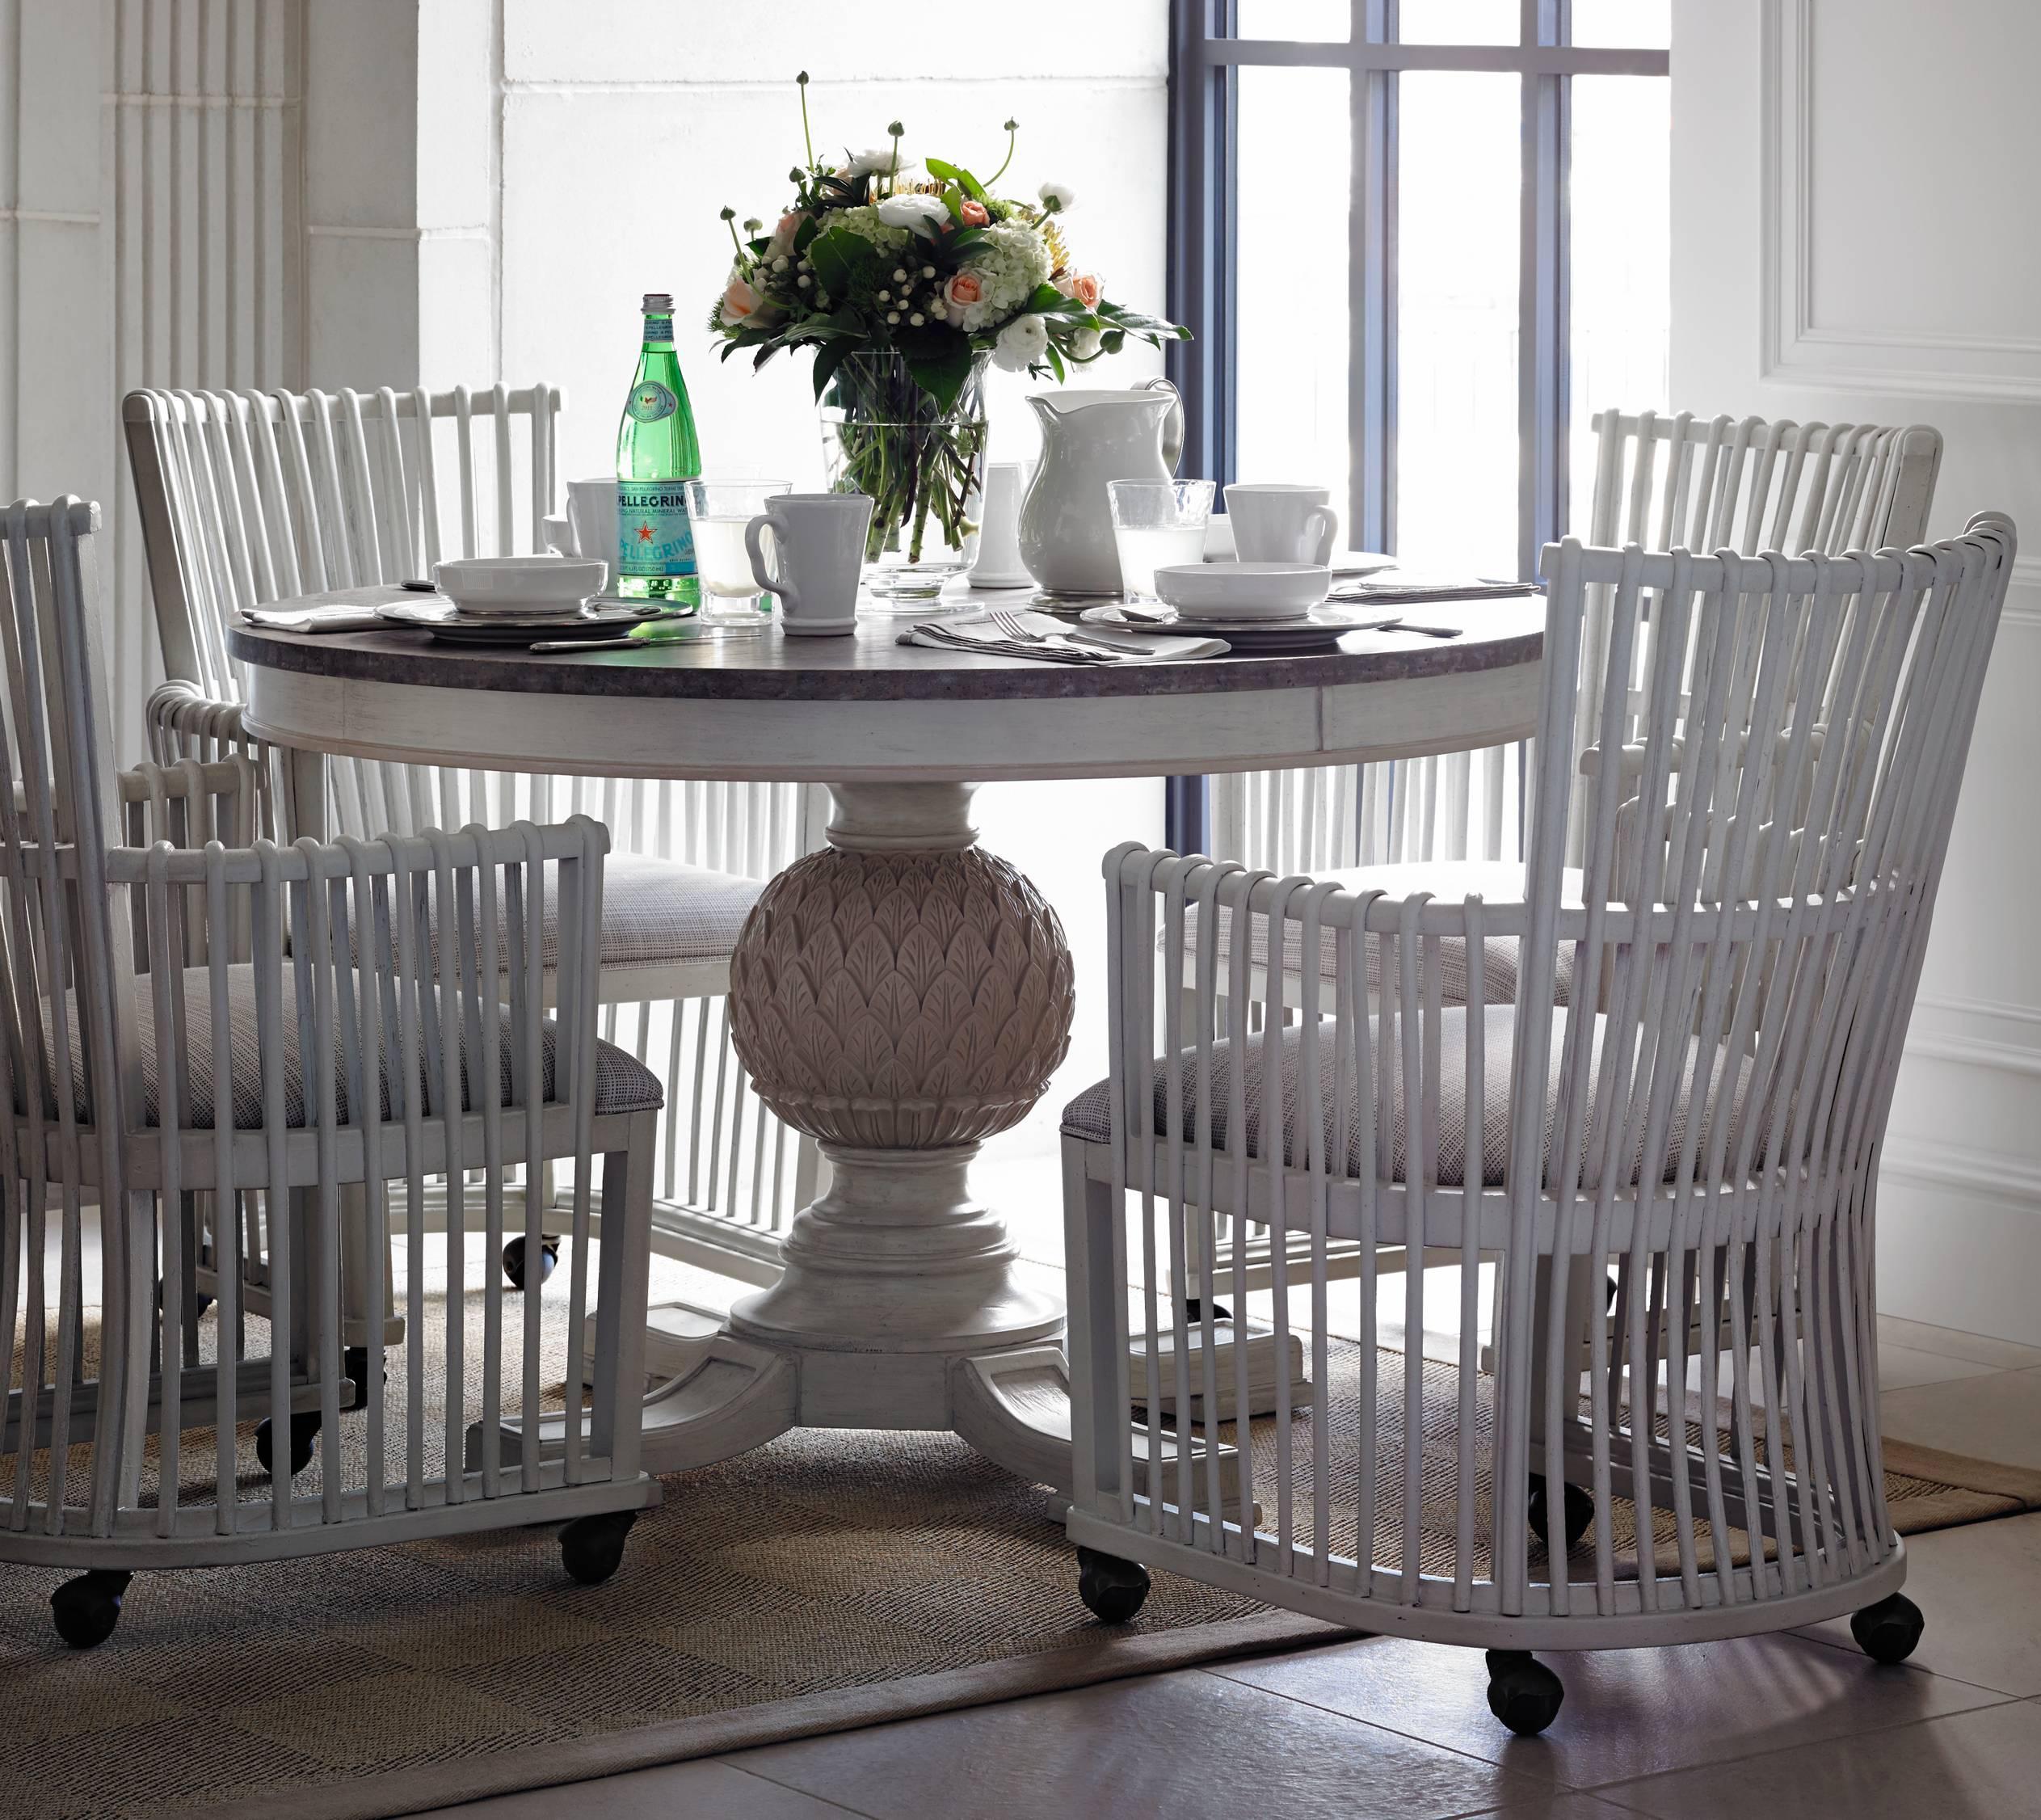 Stanley Furniture Preserve 5-Piece Artichoke Pedestal Table Set - Item Number: 340-21-30+4x69